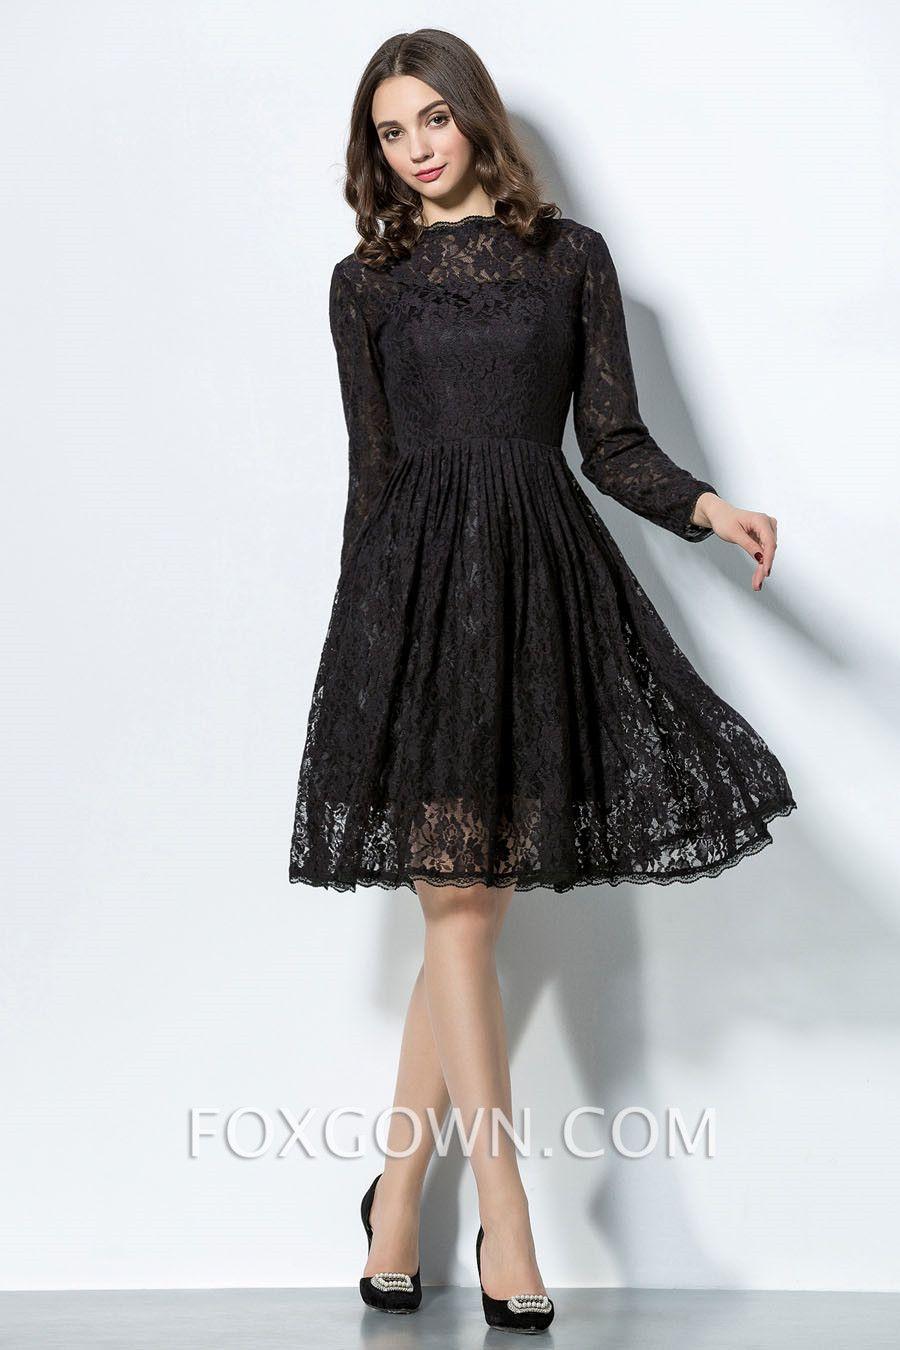 Long sleeve black wedding dresses  Related image  Inspo for my style  Pinterest  Black laces Black